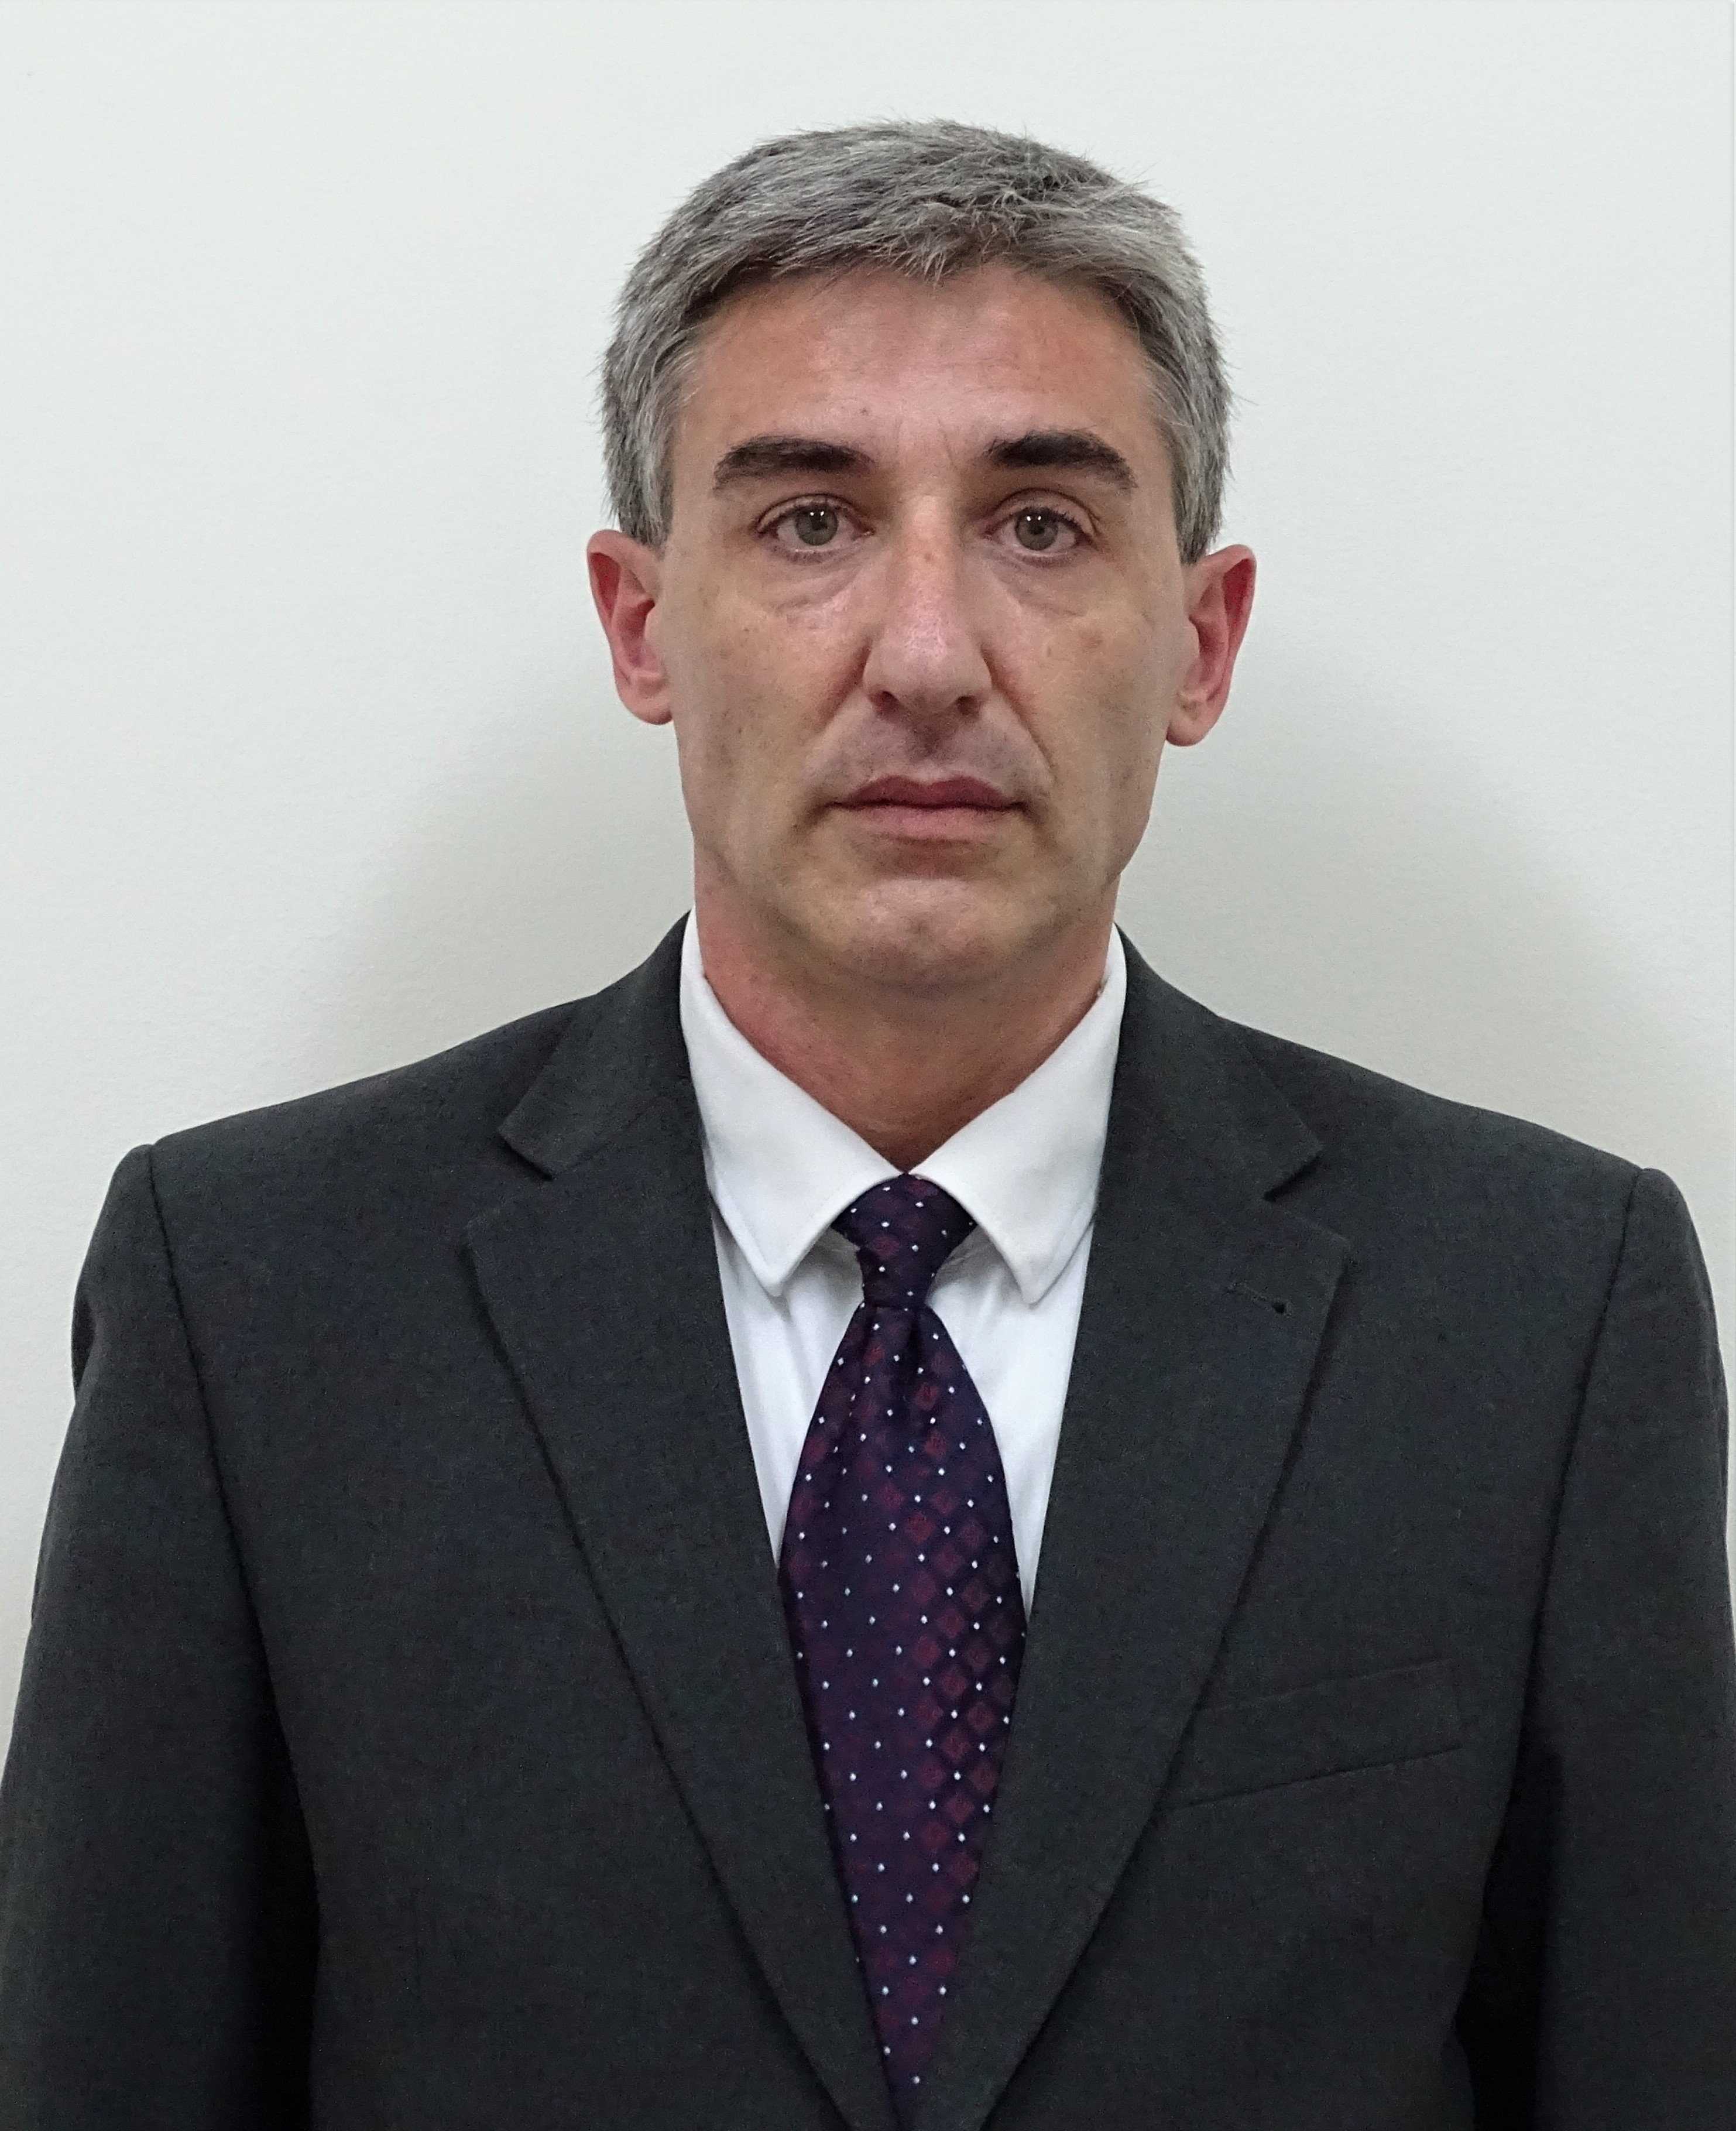 Alejandro Silveira